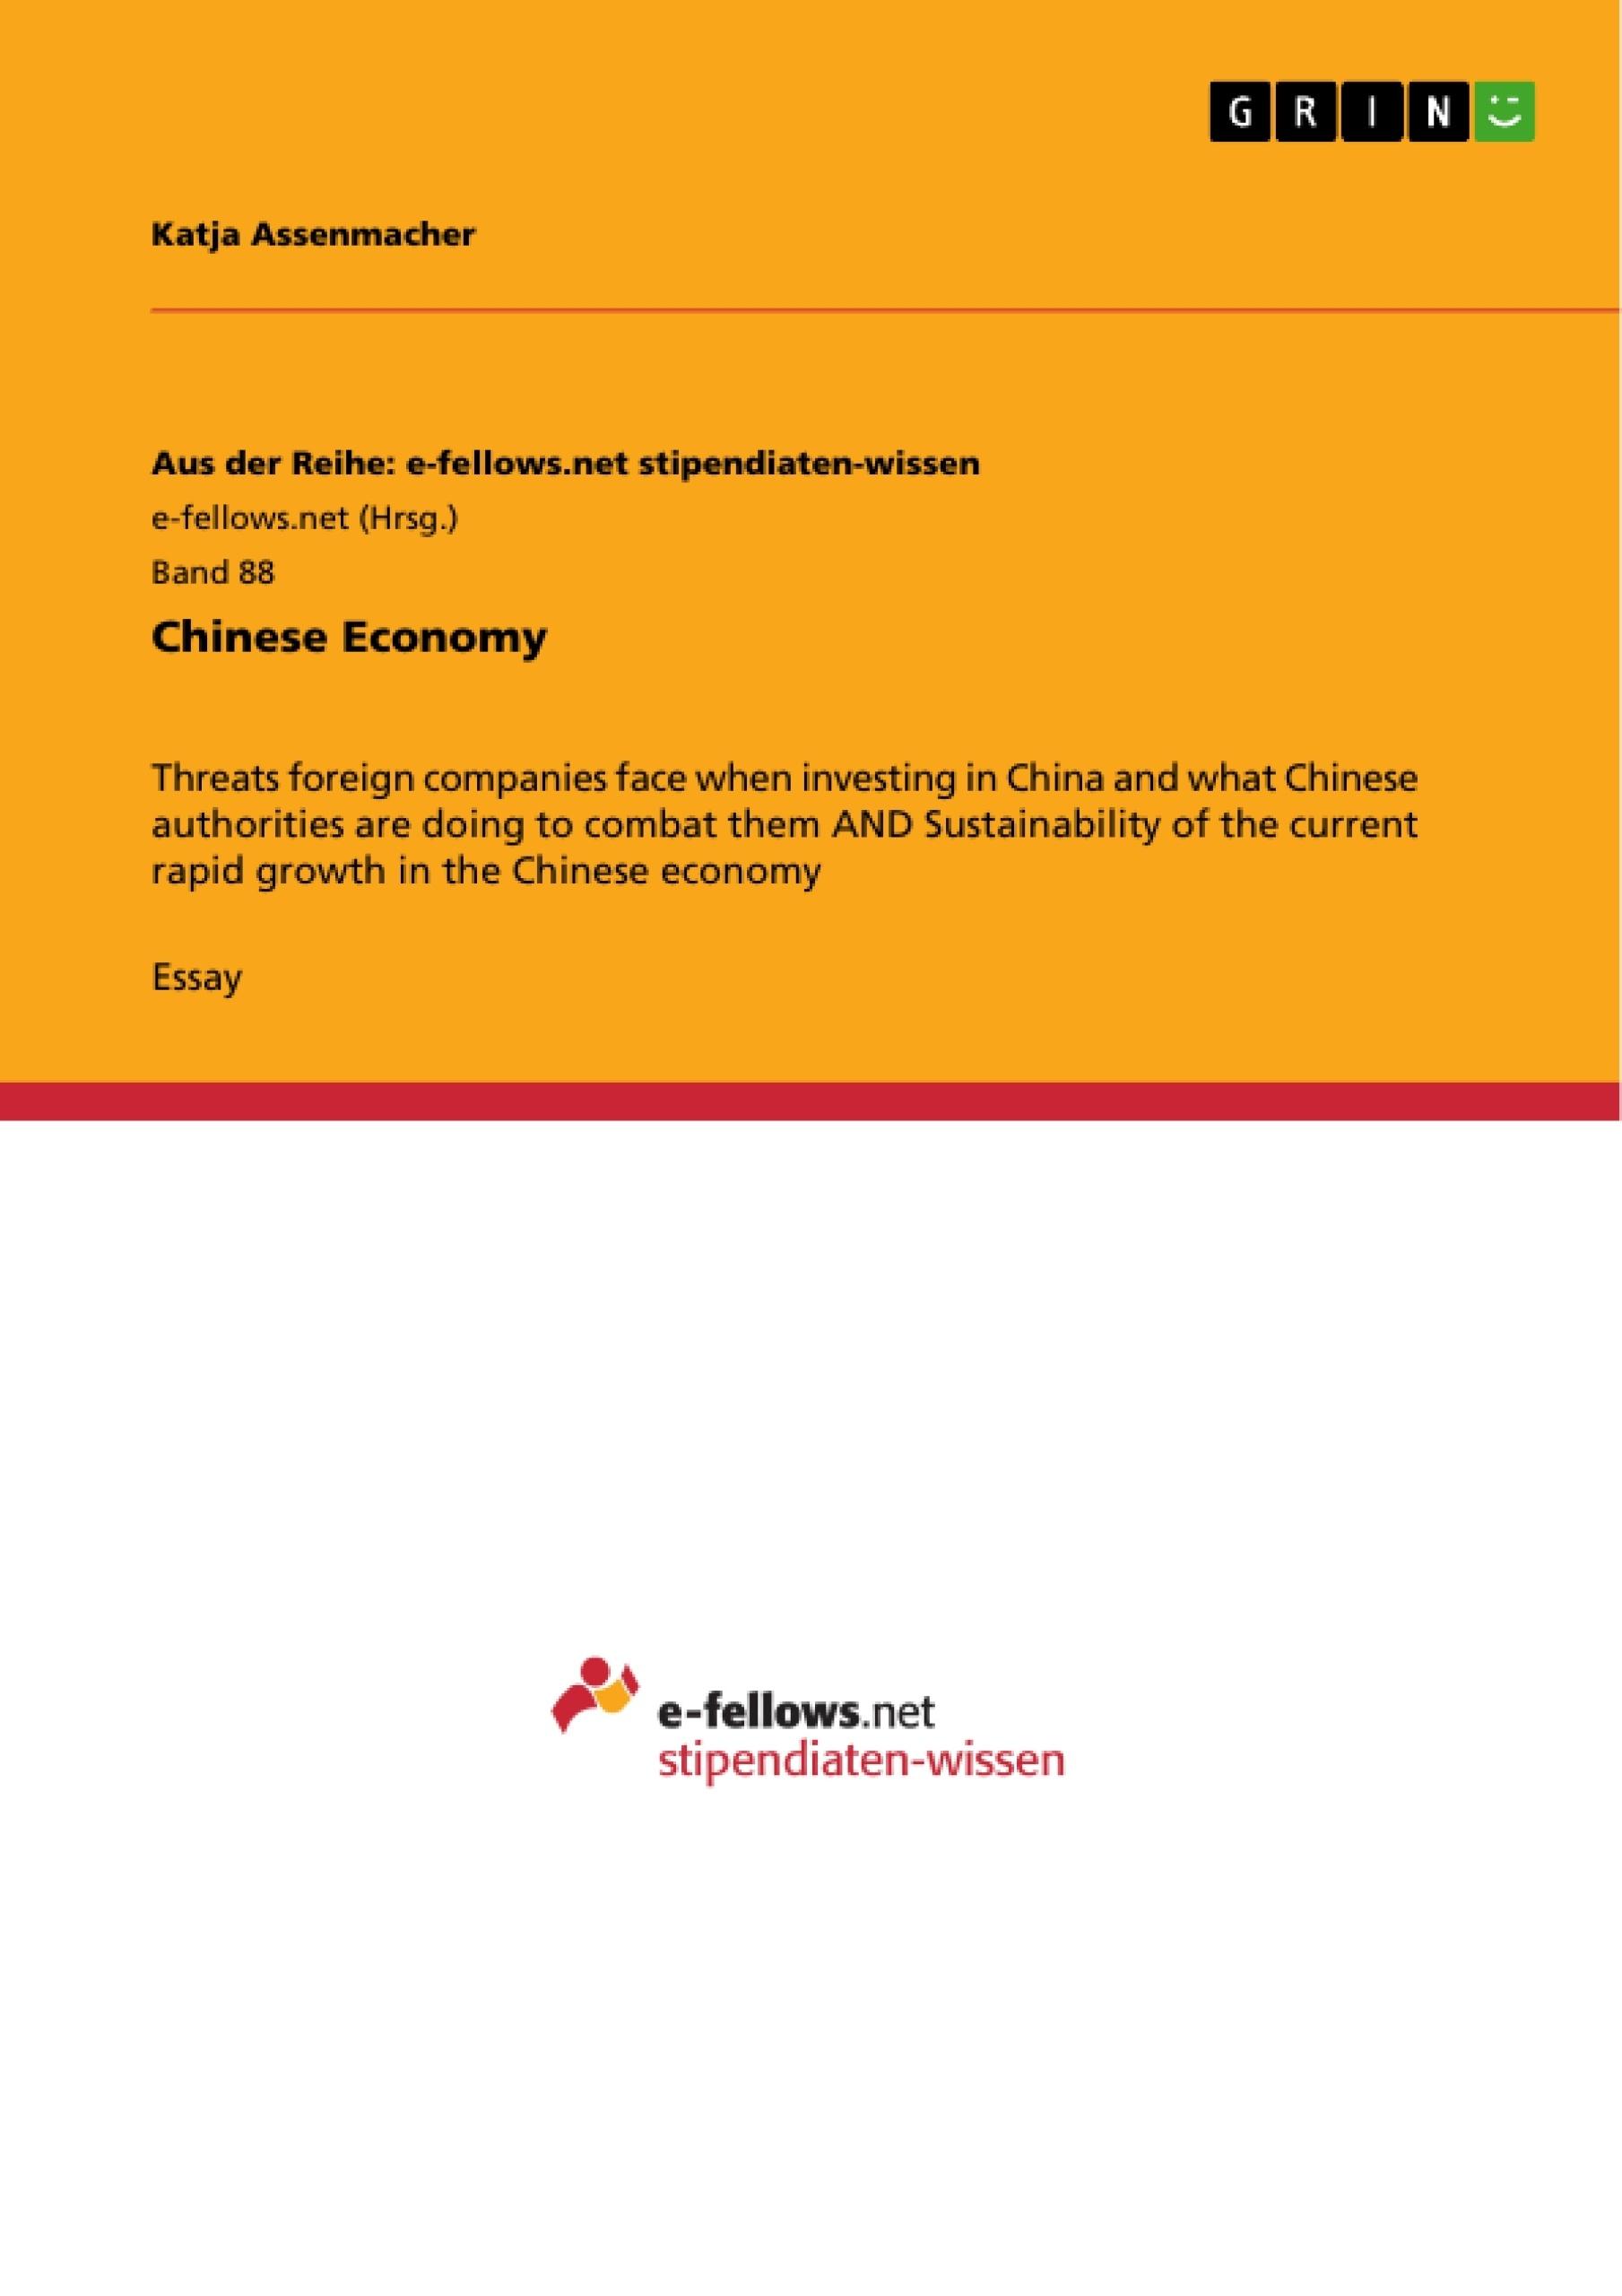 Title: Chinese Economy